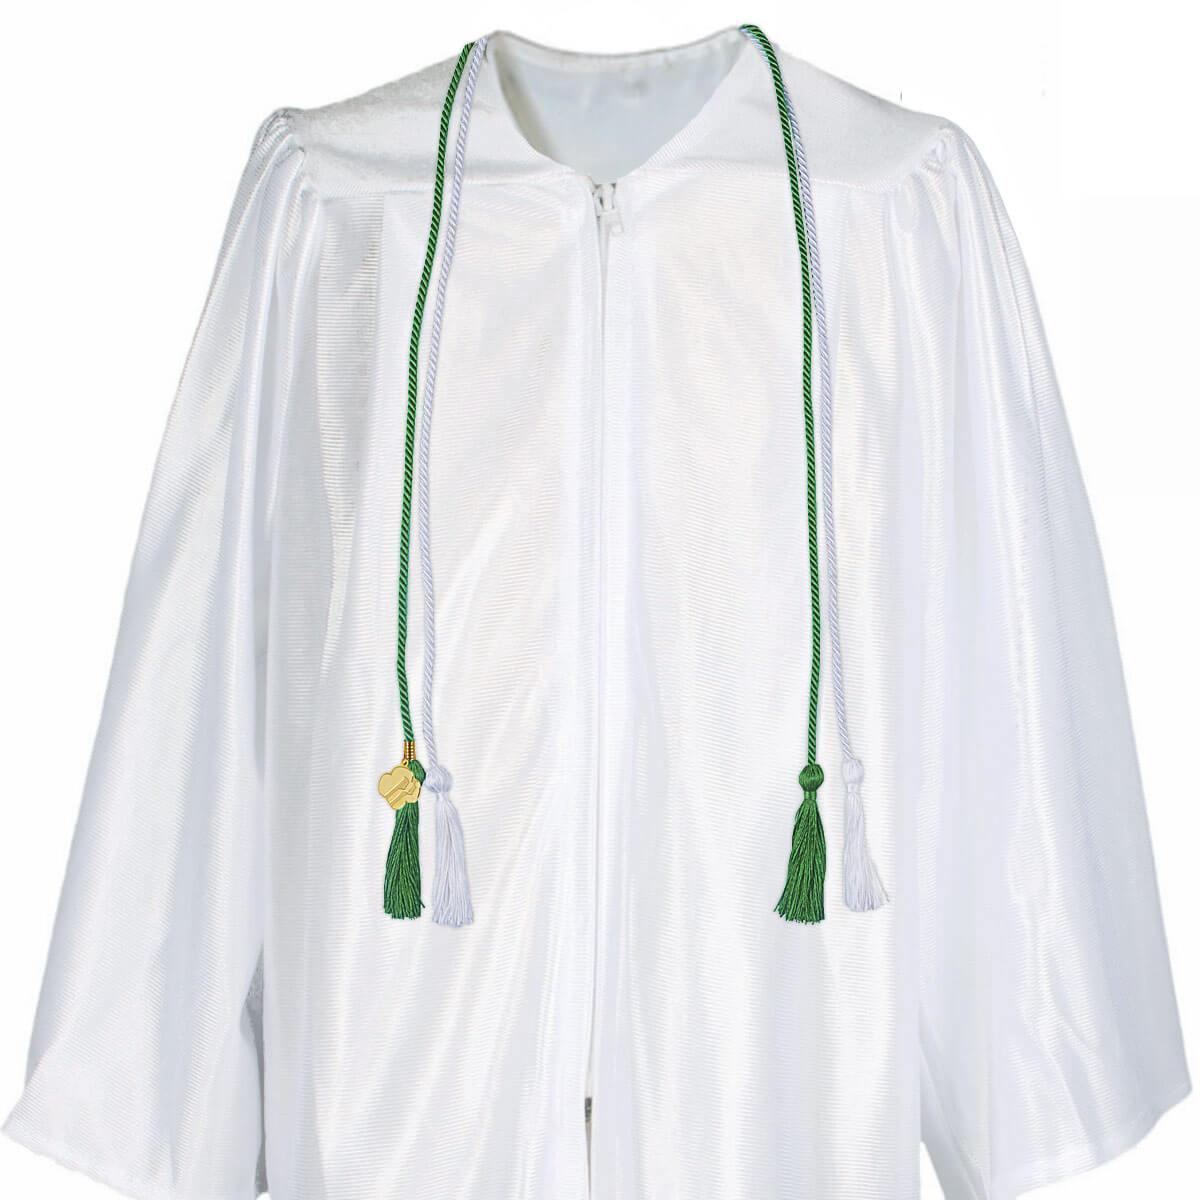 Girl Scout Graduation Regalia Recog